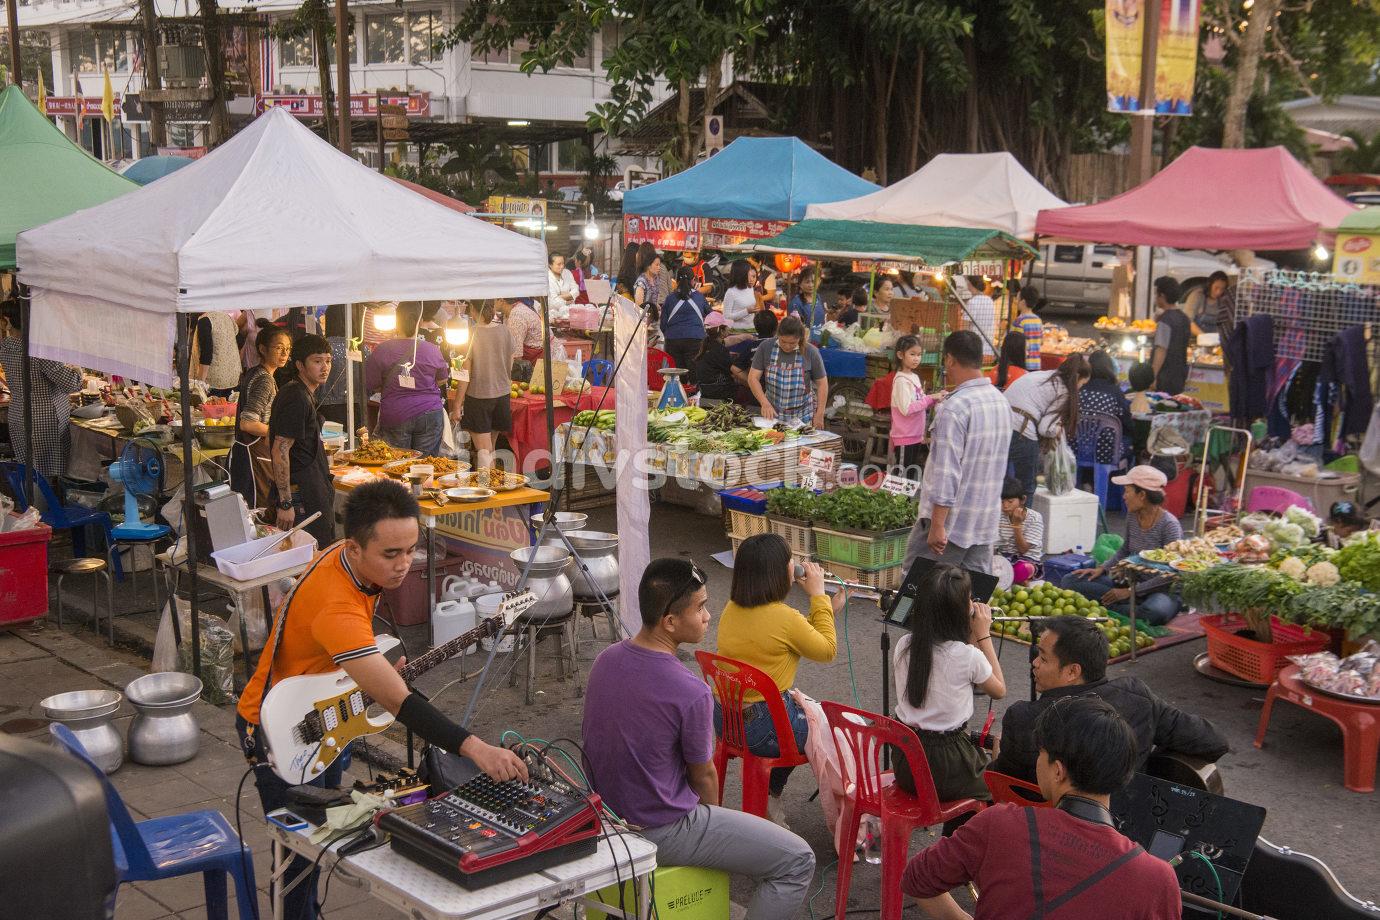 THAILAND CHIANG SAEN MEKONG NIGHT MARKET